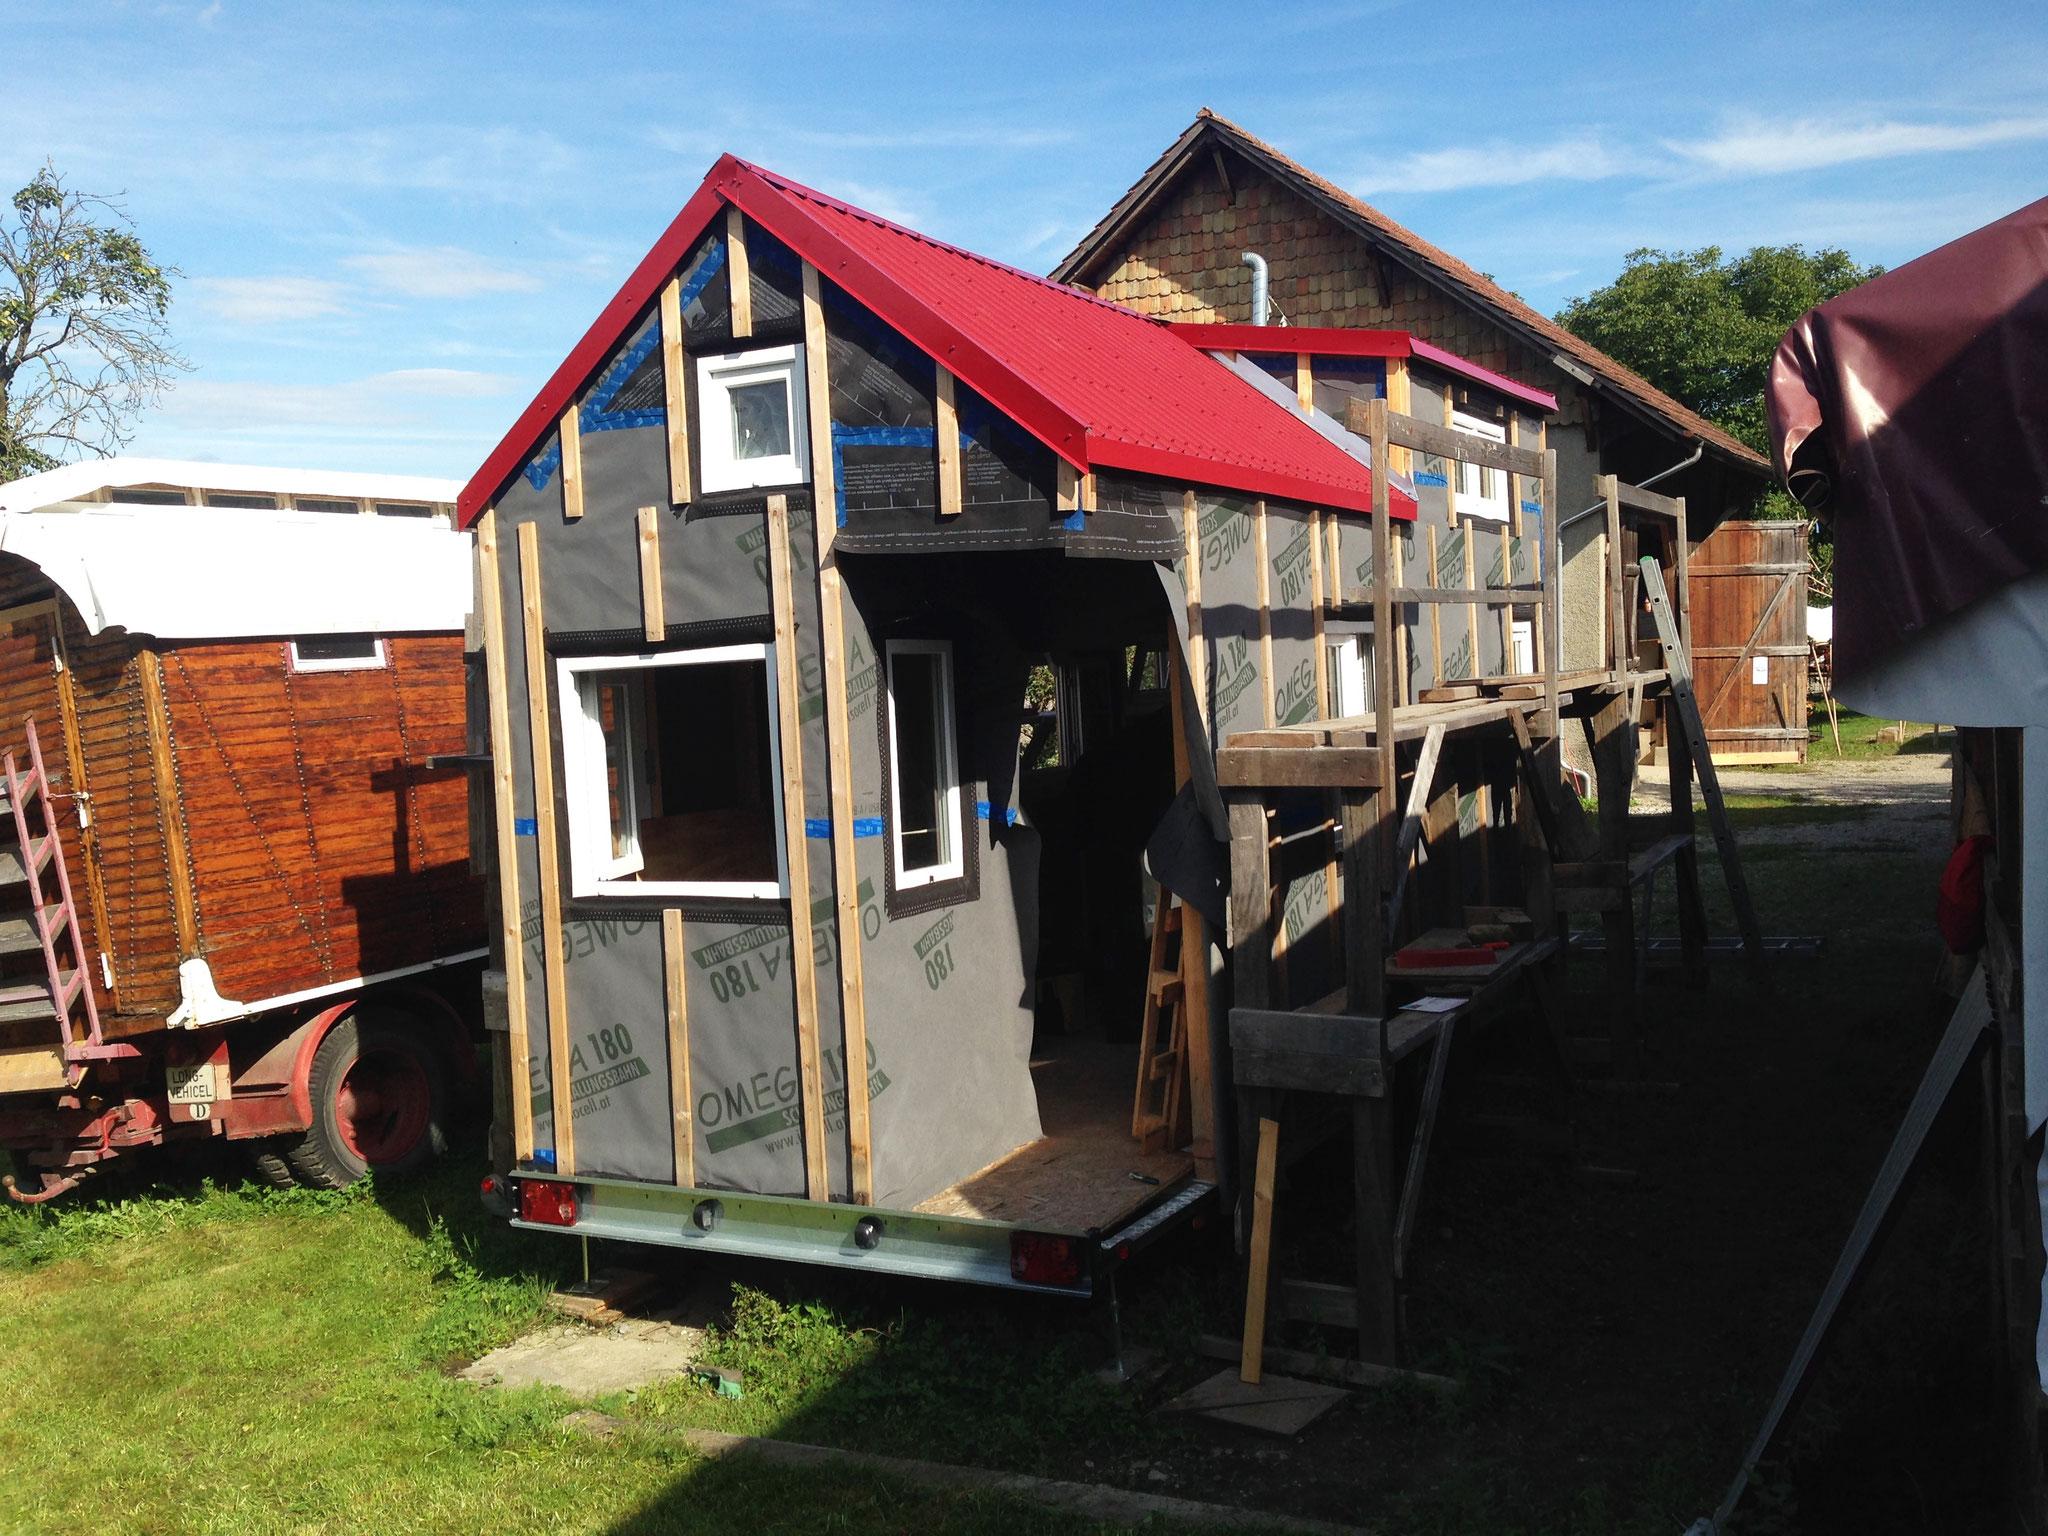 herzlich willkommen tiny house projekt schweiz. Black Bedroom Furniture Sets. Home Design Ideas